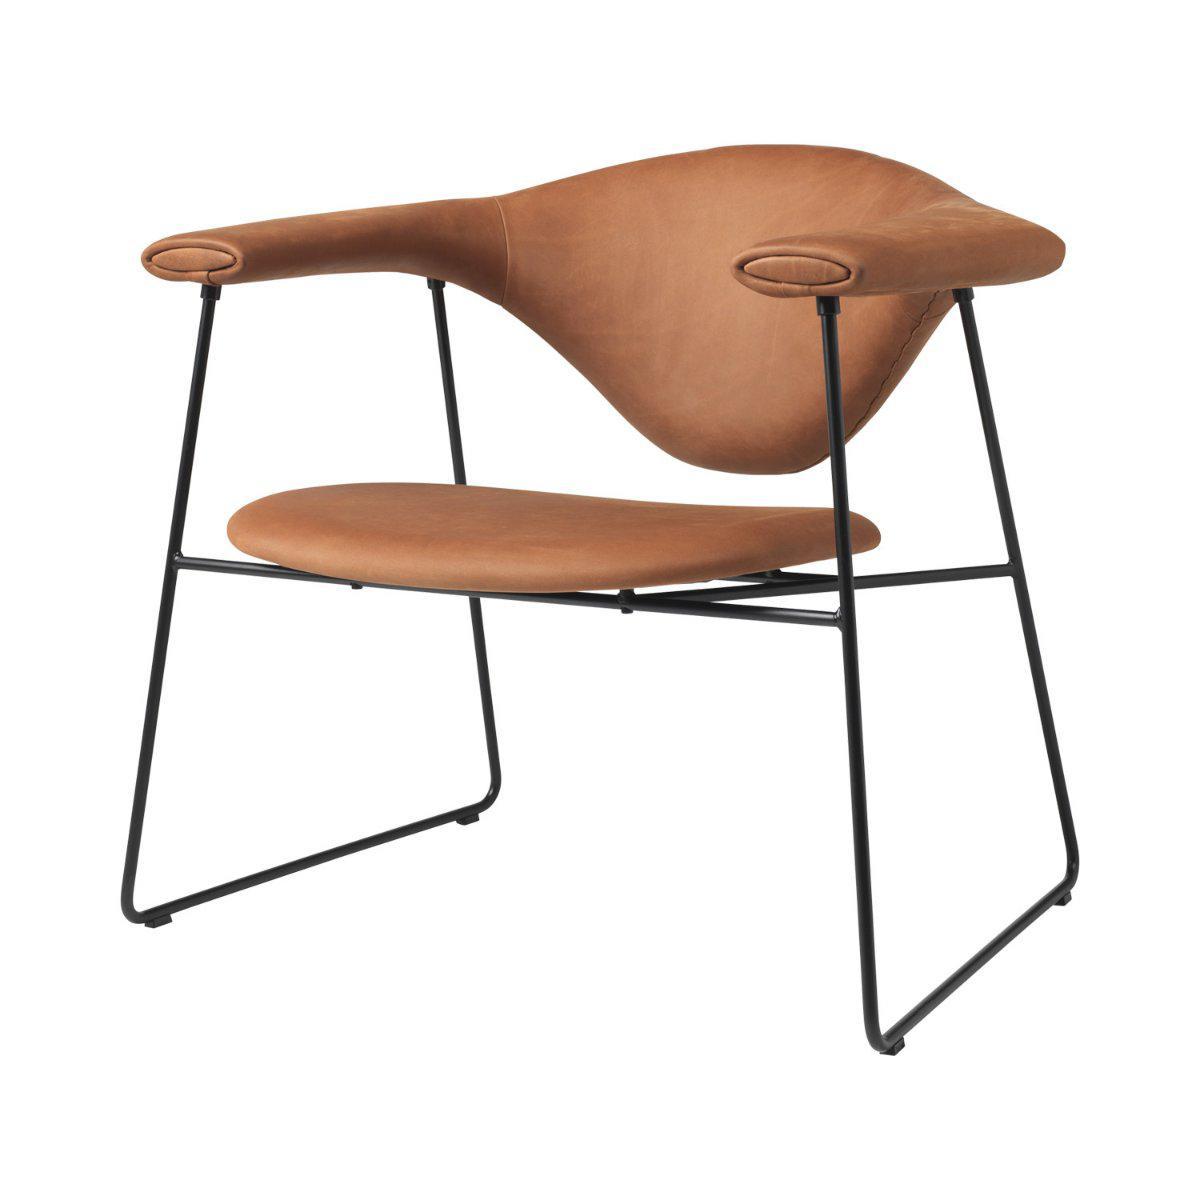 Masculo Lounge Chair Sledge Base Gubi Rypen